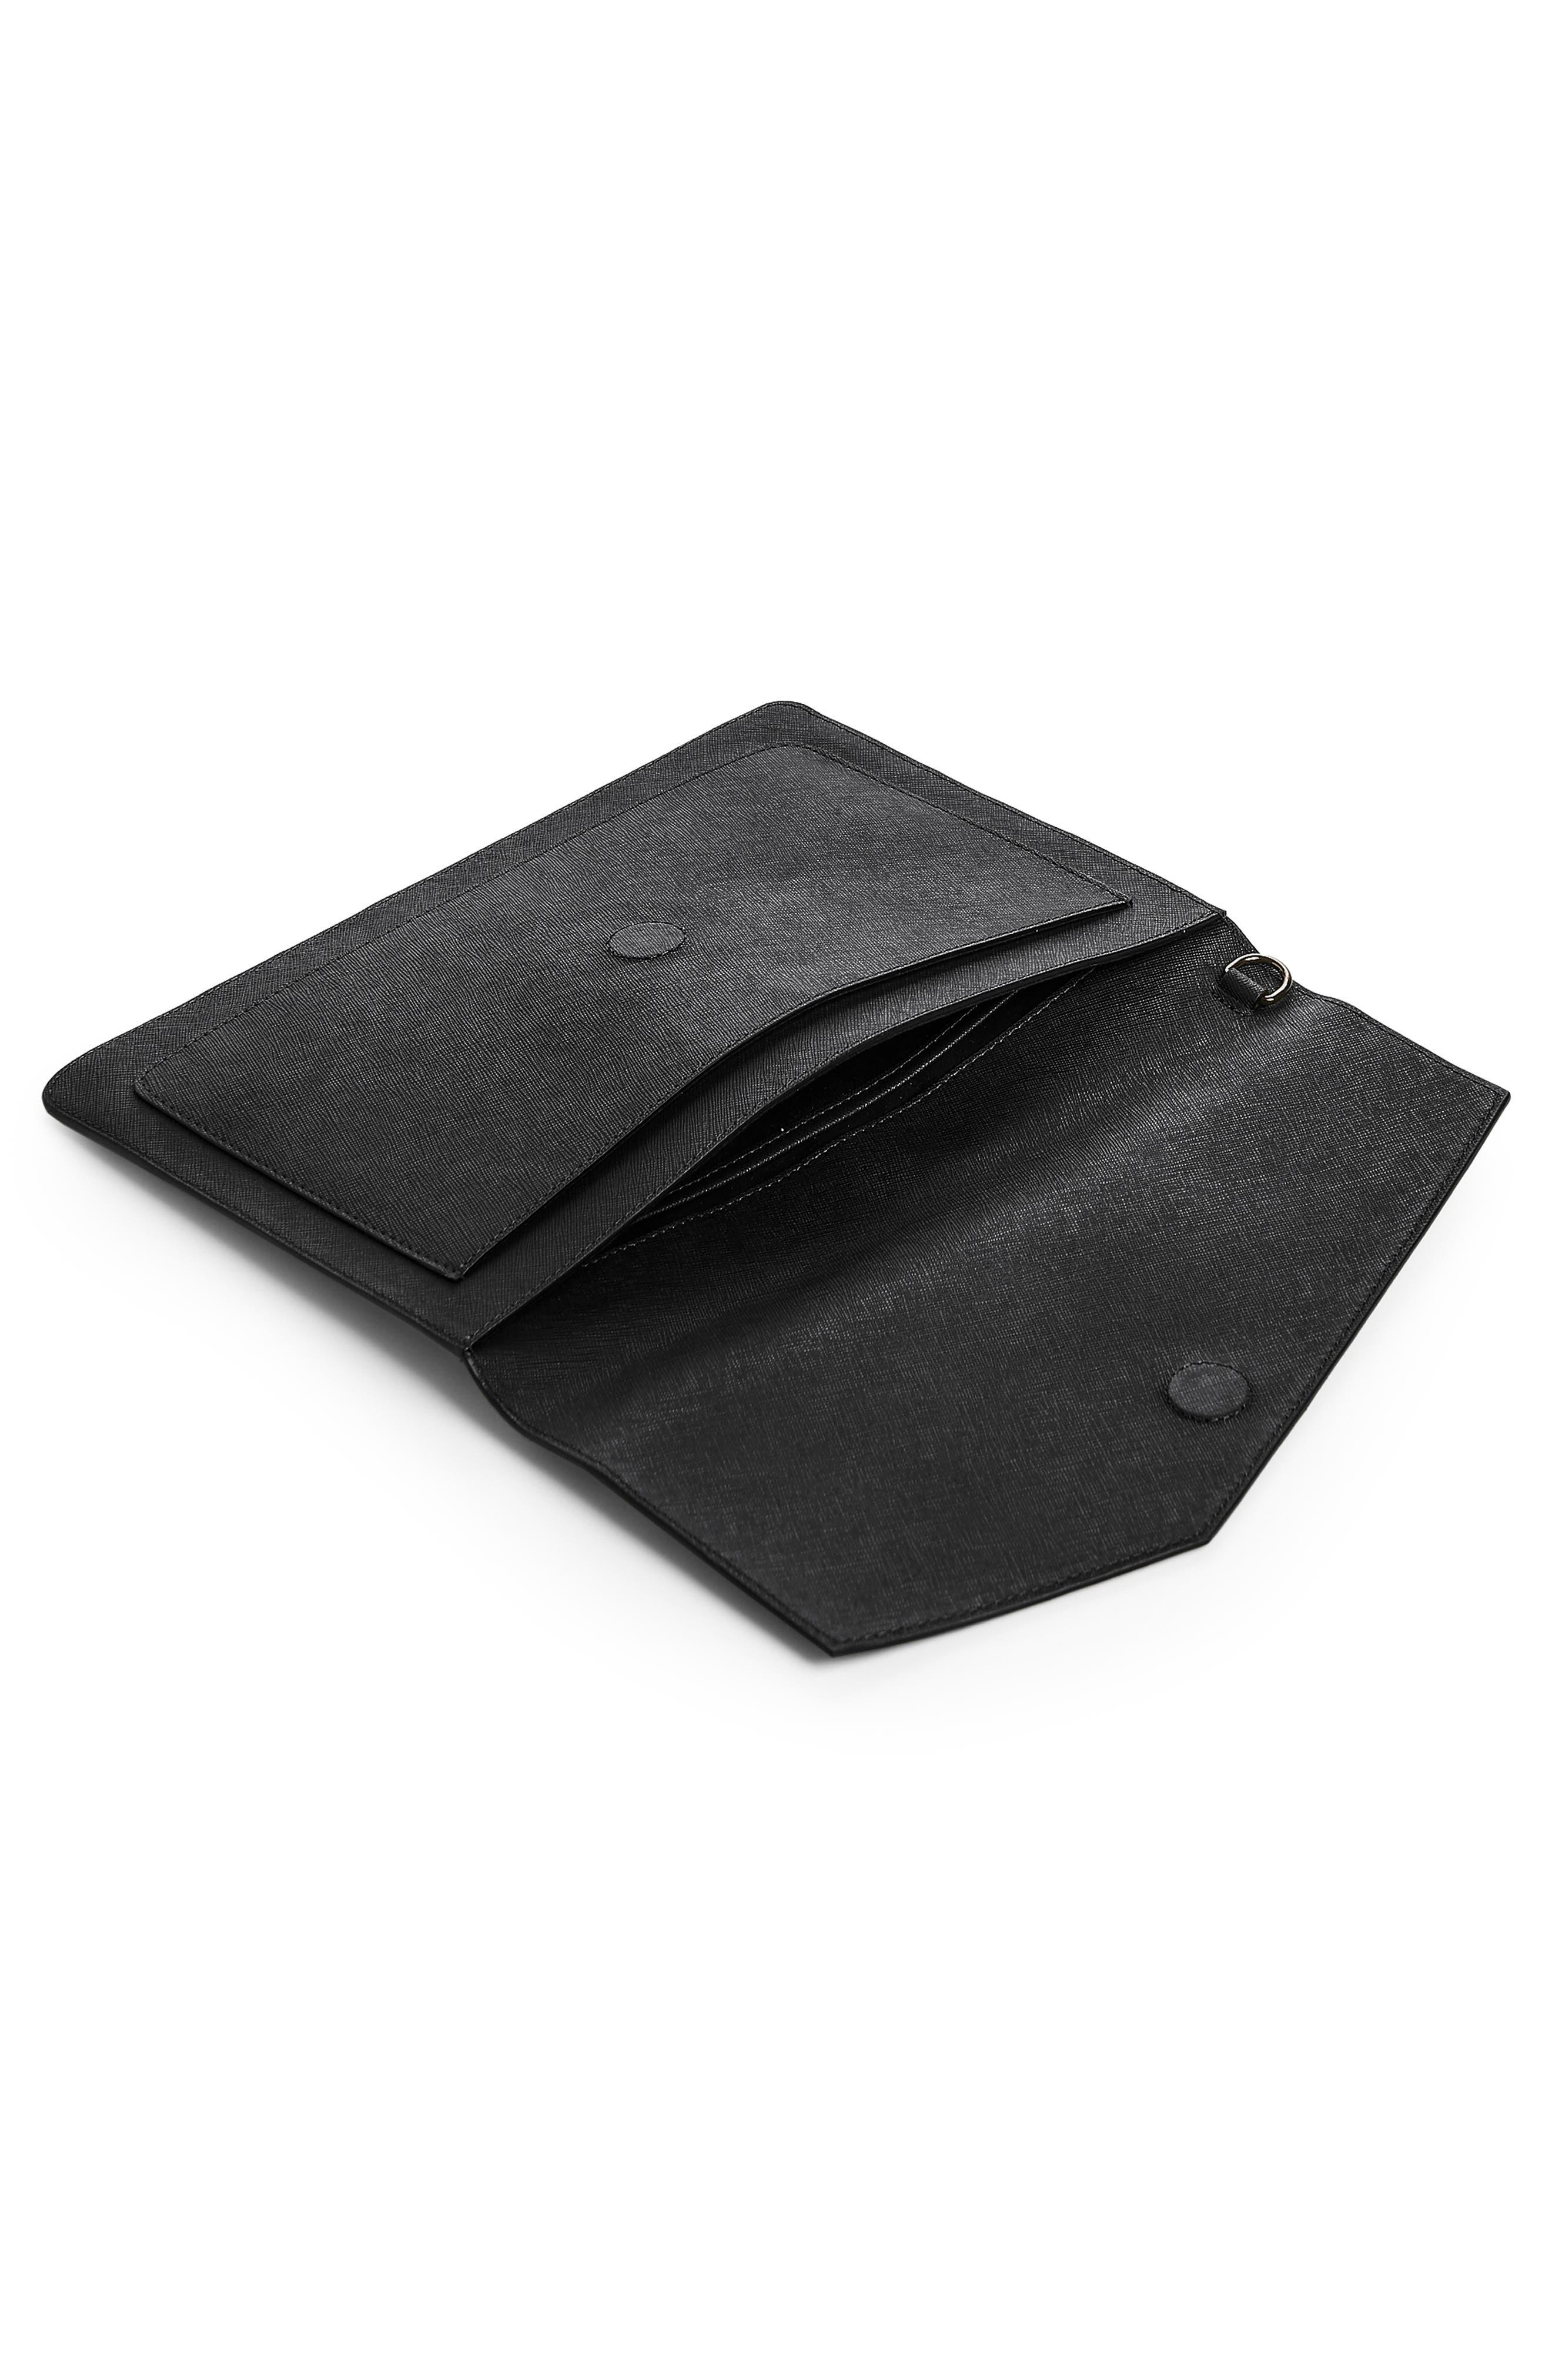 BOTKIER, Cobble Hill Calfskin Leather Flap Clutch, Alternate thumbnail 3, color, 001